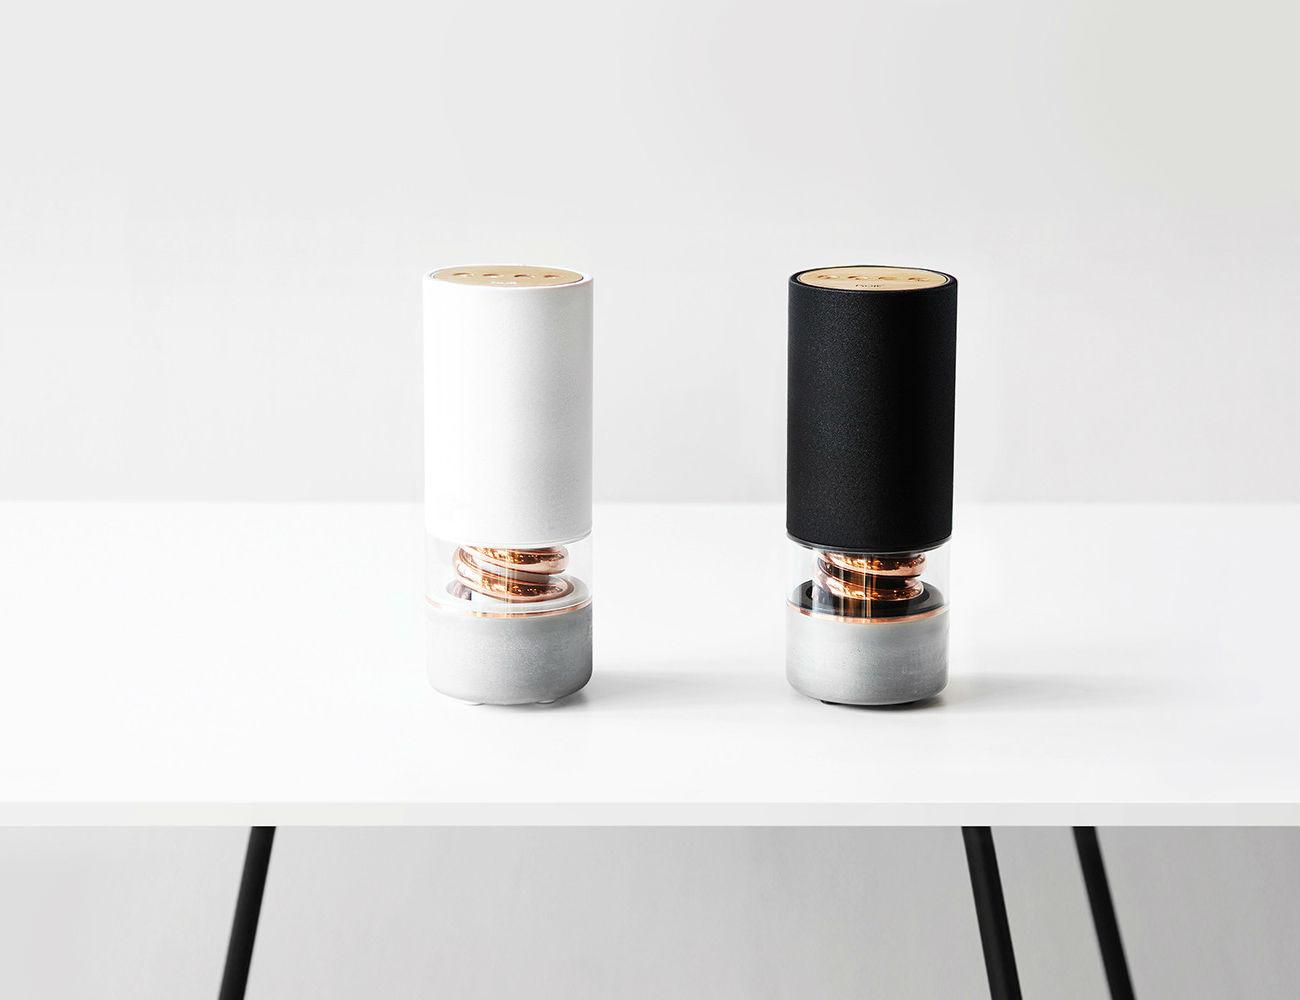 Pavilion Wireless Speaker & D-Spiral Acoustic System by Hult Design